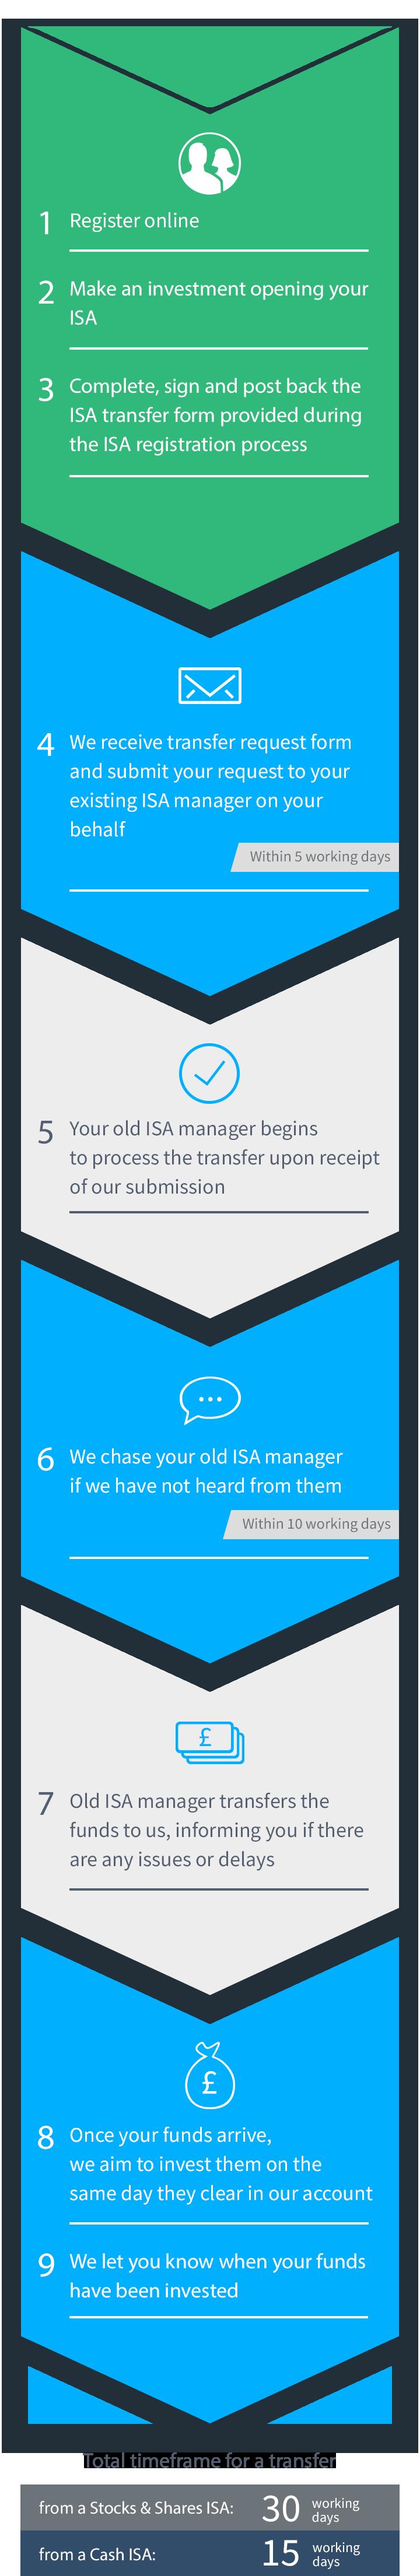 Transfer Process Illustration